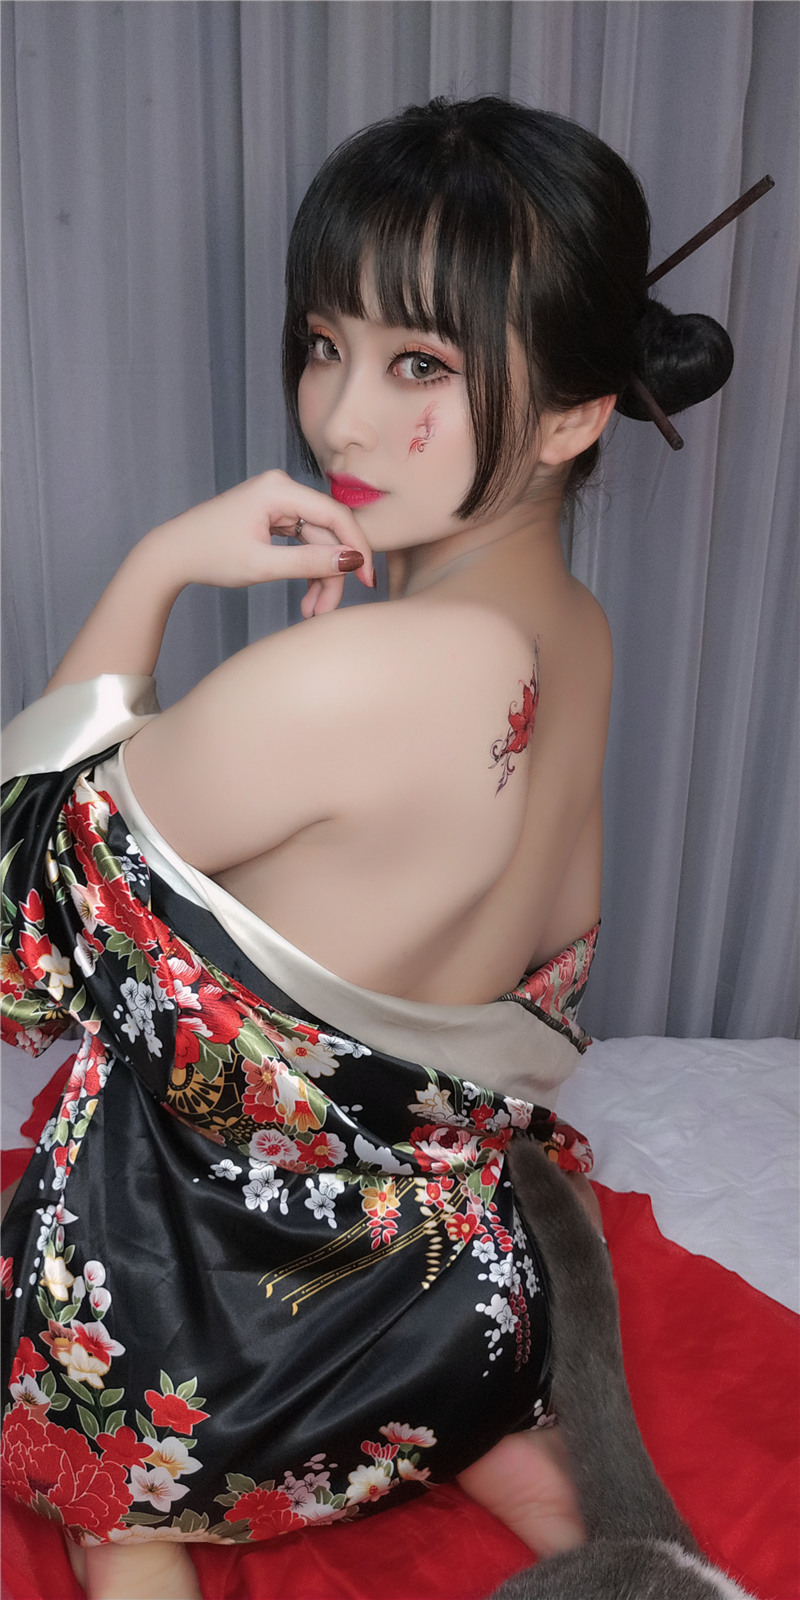 洛璃 LoLiSAMA – 歌舞伎 [92P10V]